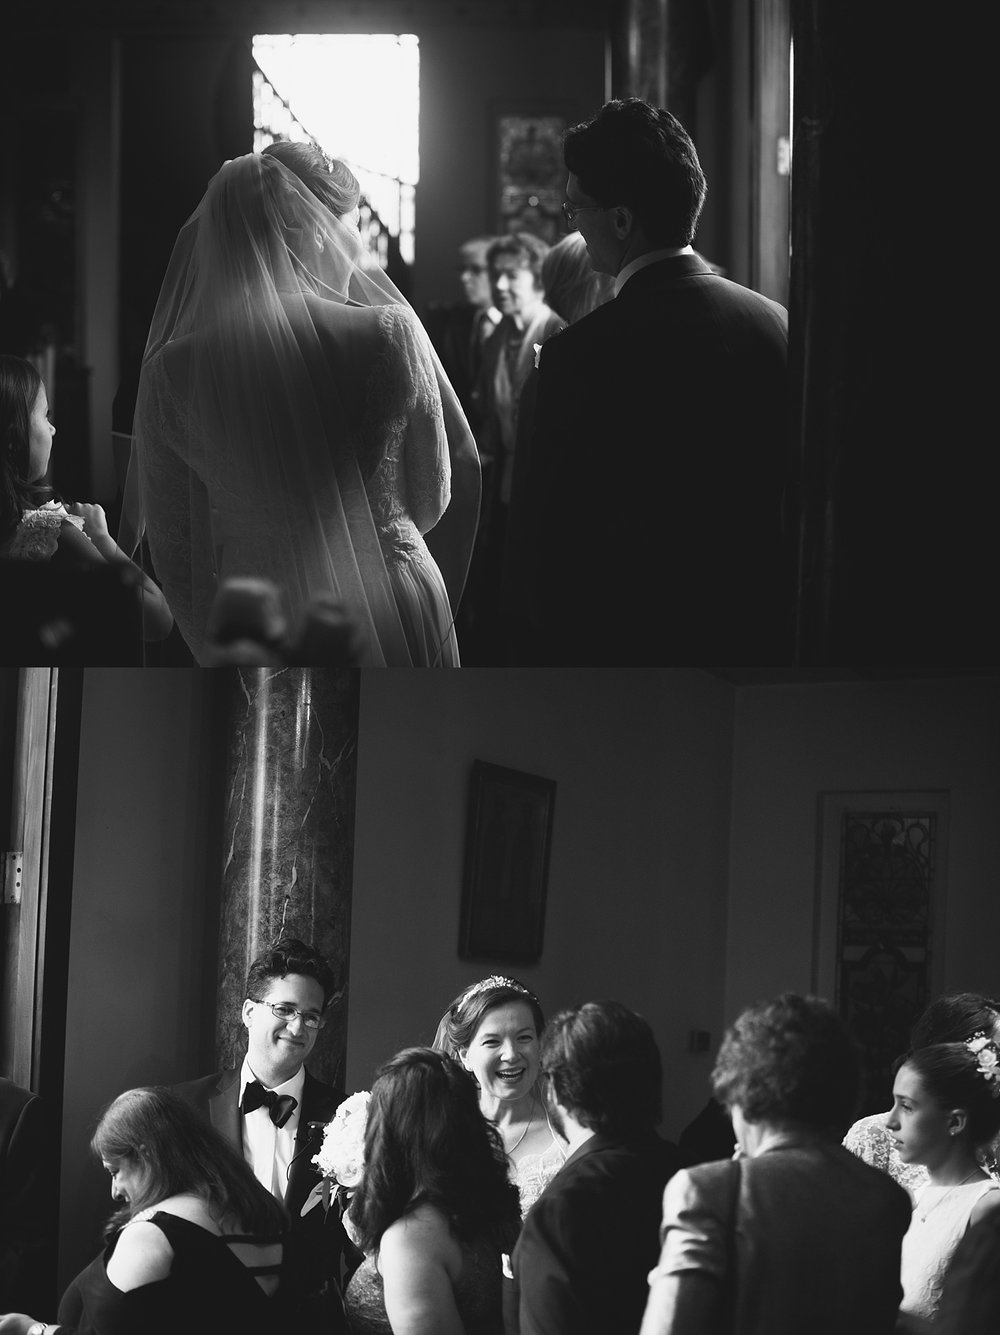 philadelphia wedding photography cherie_0031.jpg